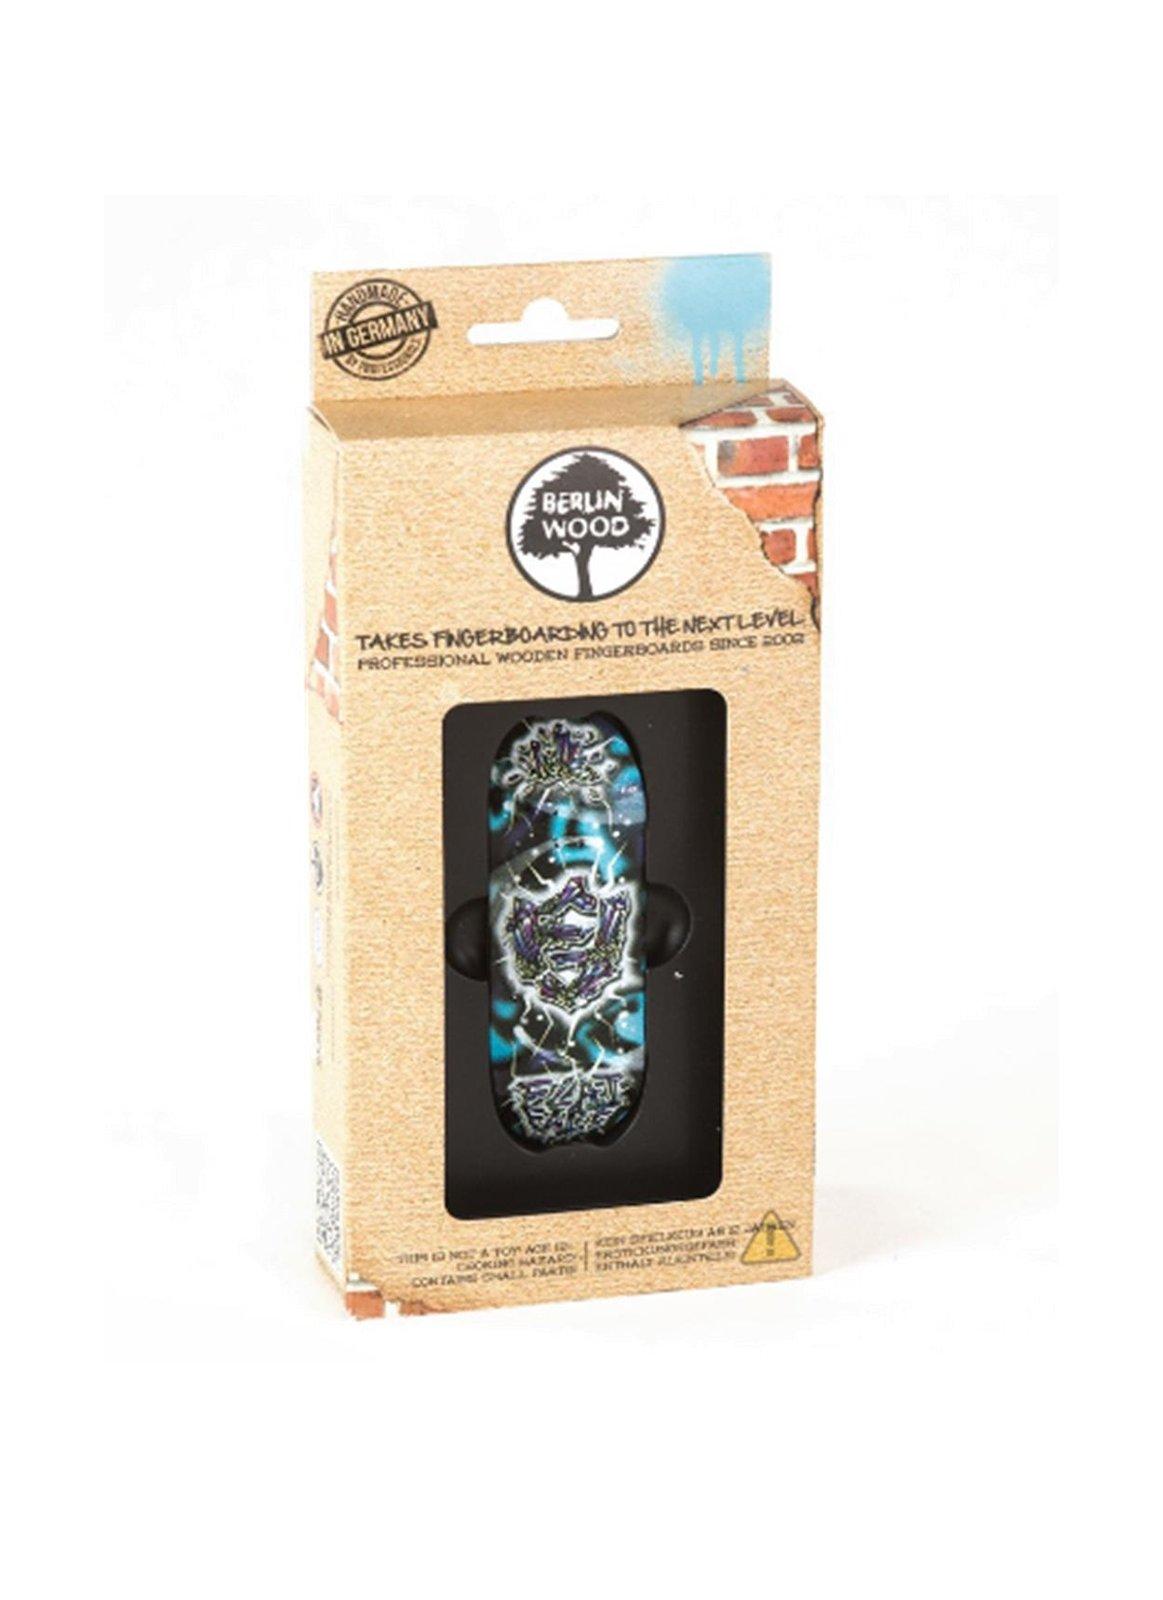 Flatface Fingerboards Uk Shop Fingerboard E Store